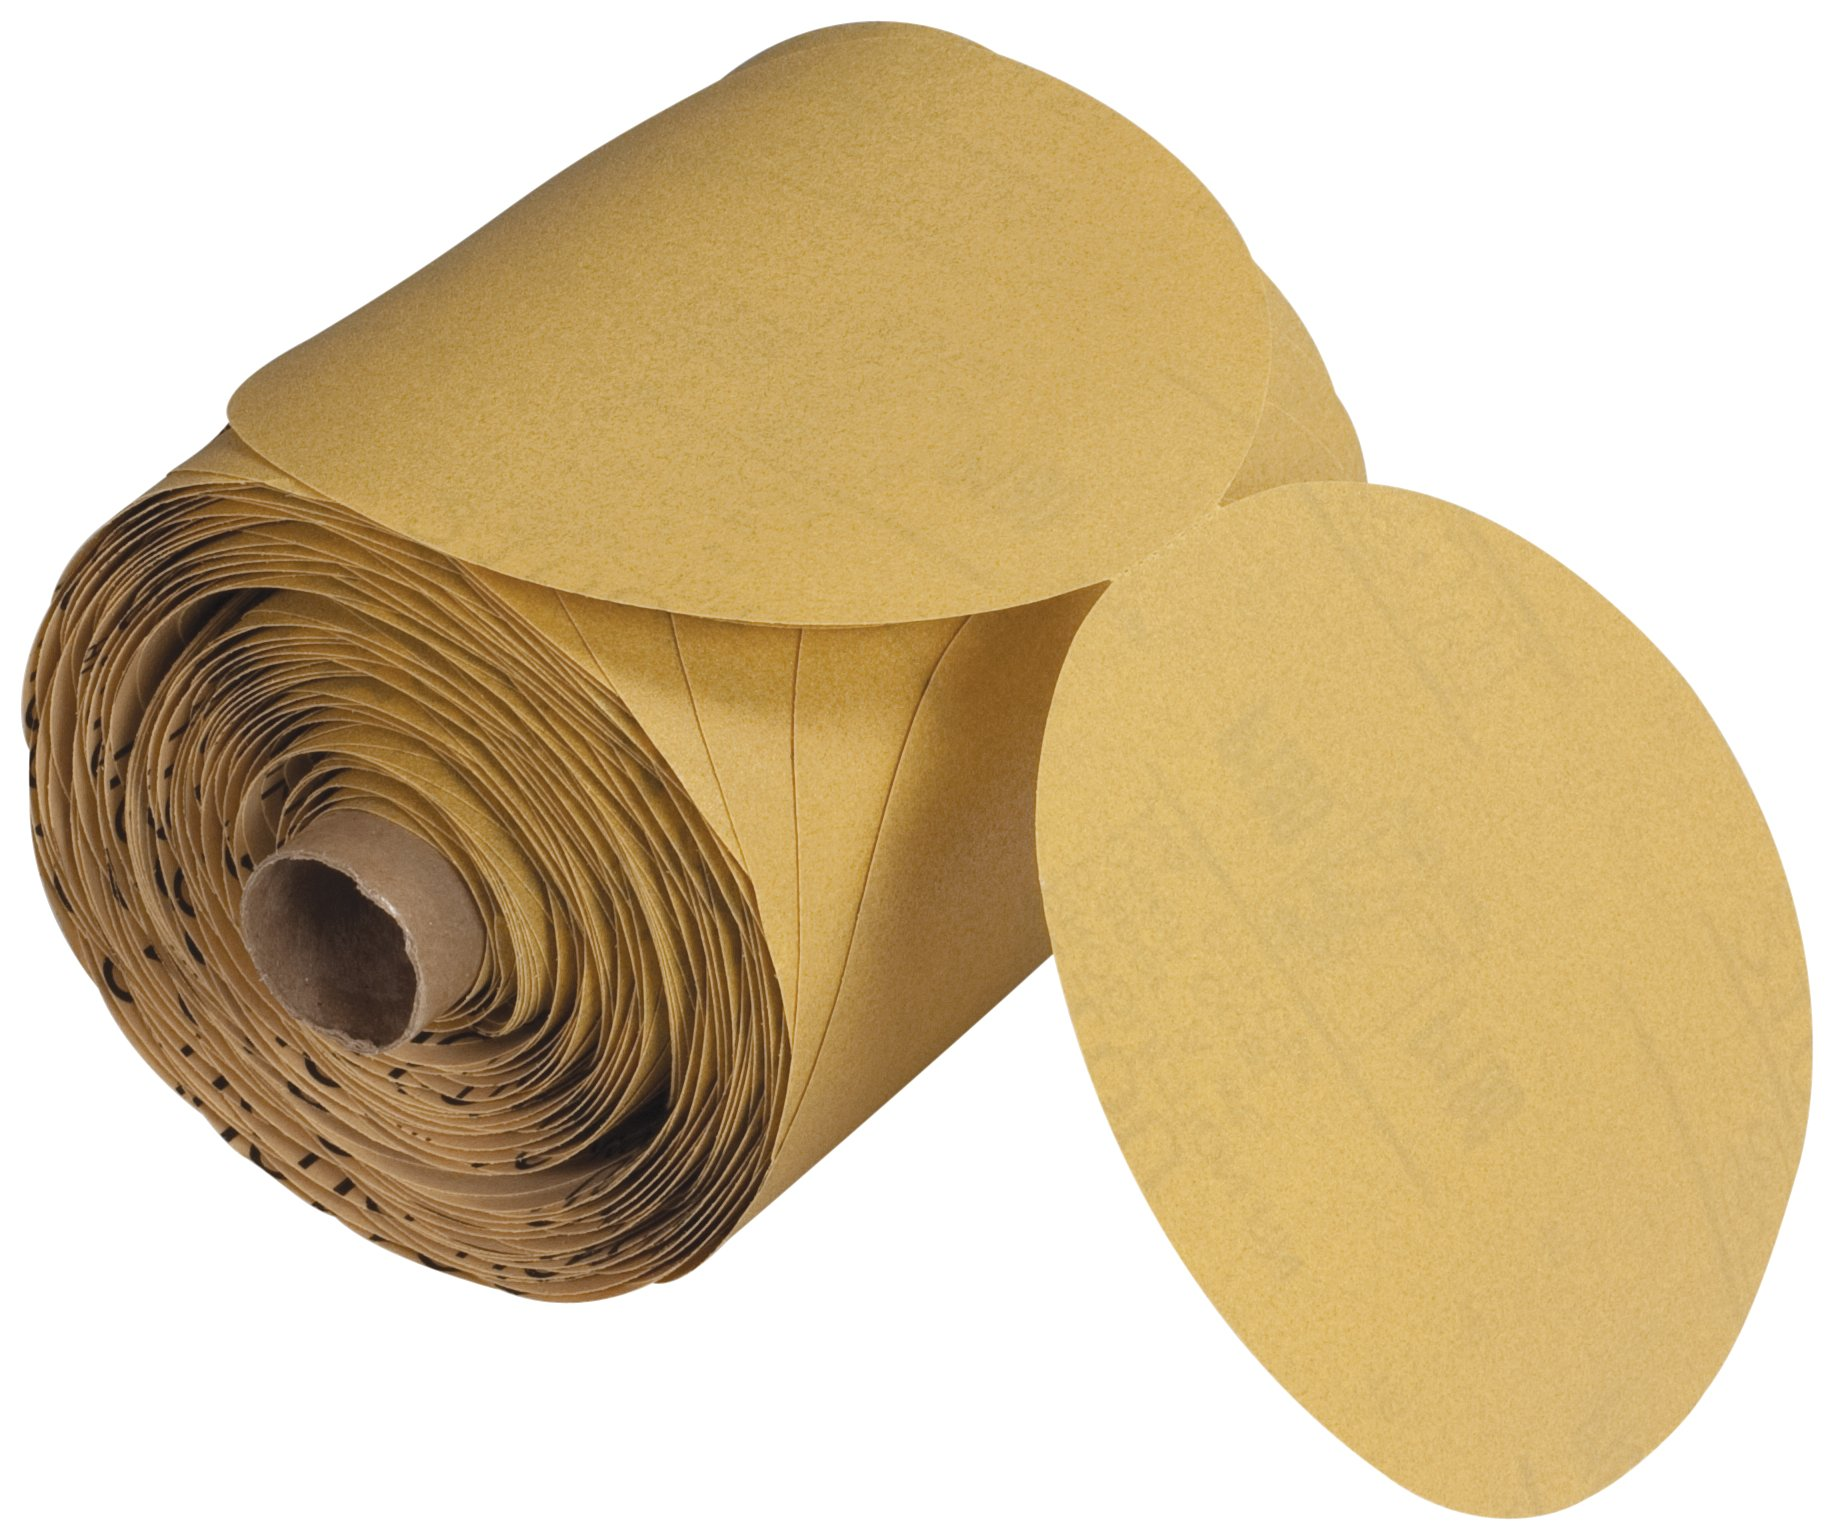 3M Stikit Paper Disc Roll 210U, Aluminum Oxide, 5'' Diameter, P400 Grit (Roll of 250)